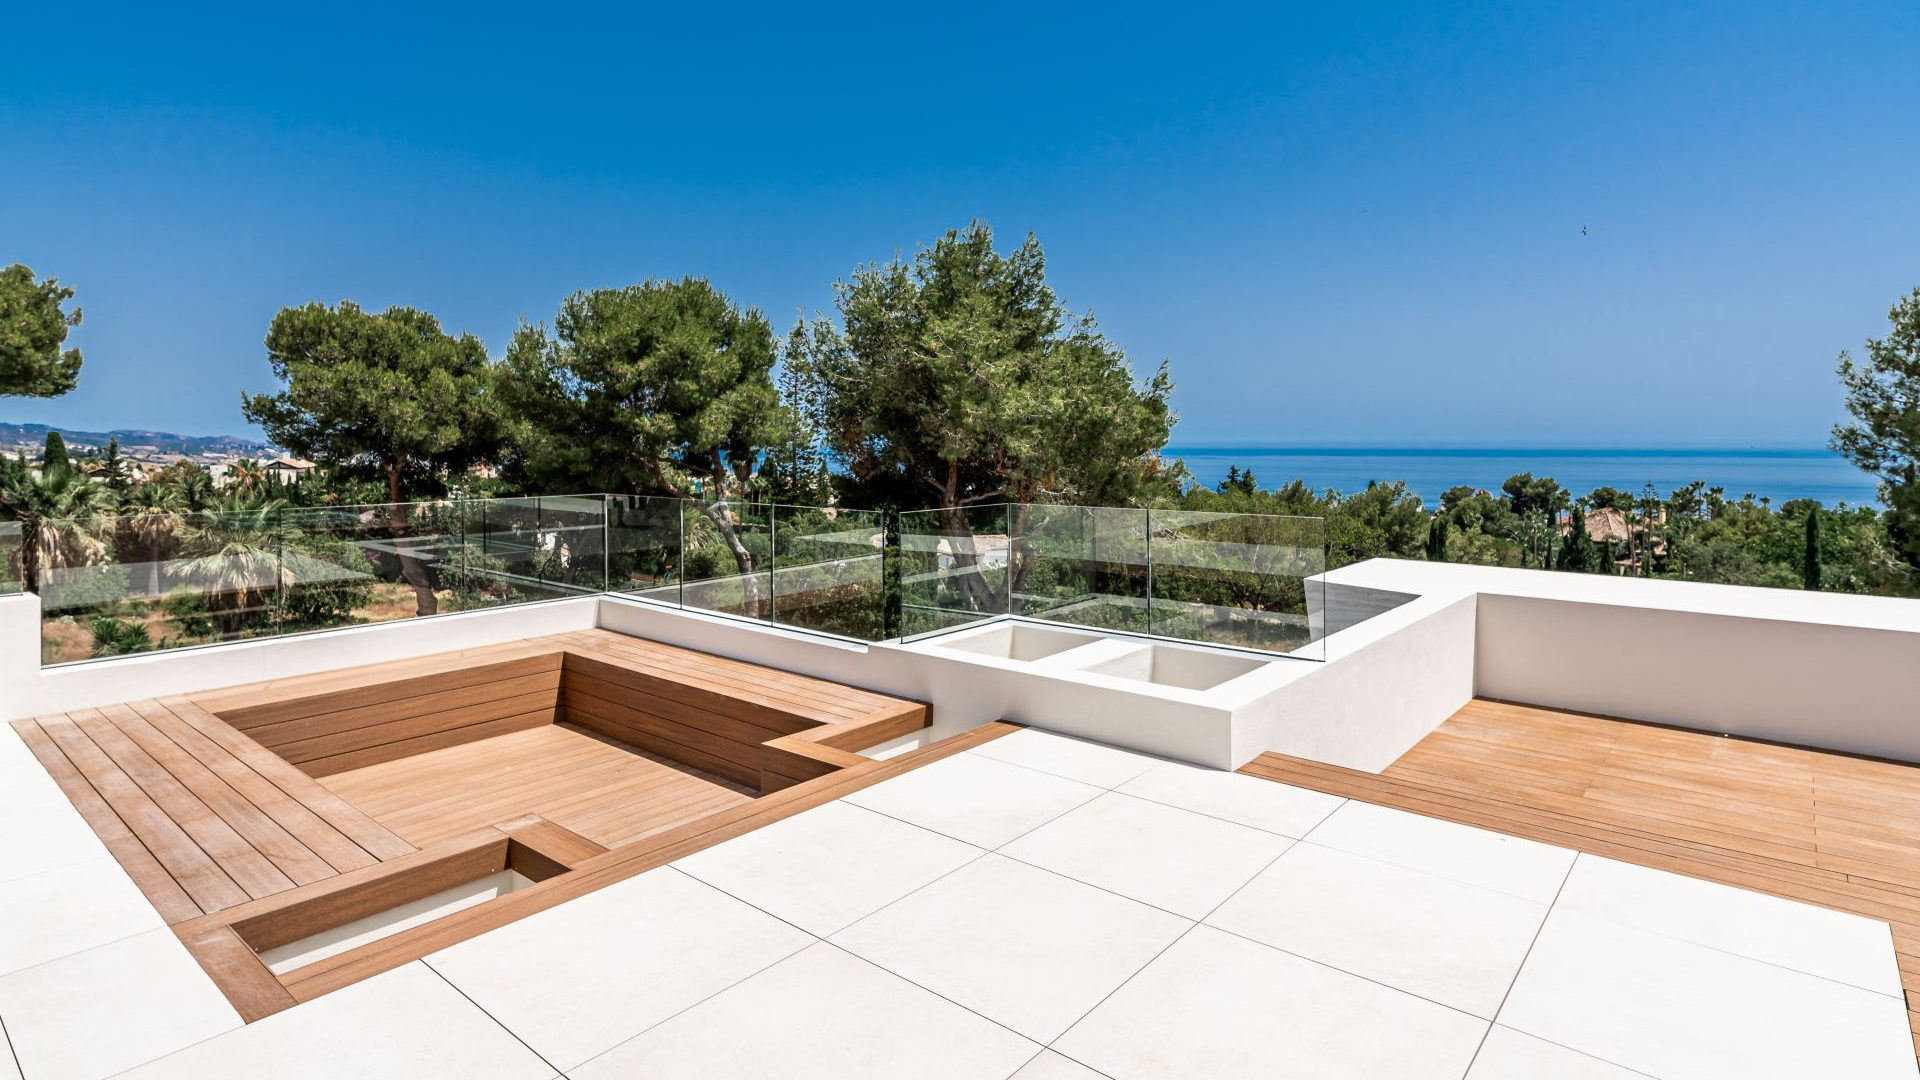 Impressive Jacuzzi offering sea views